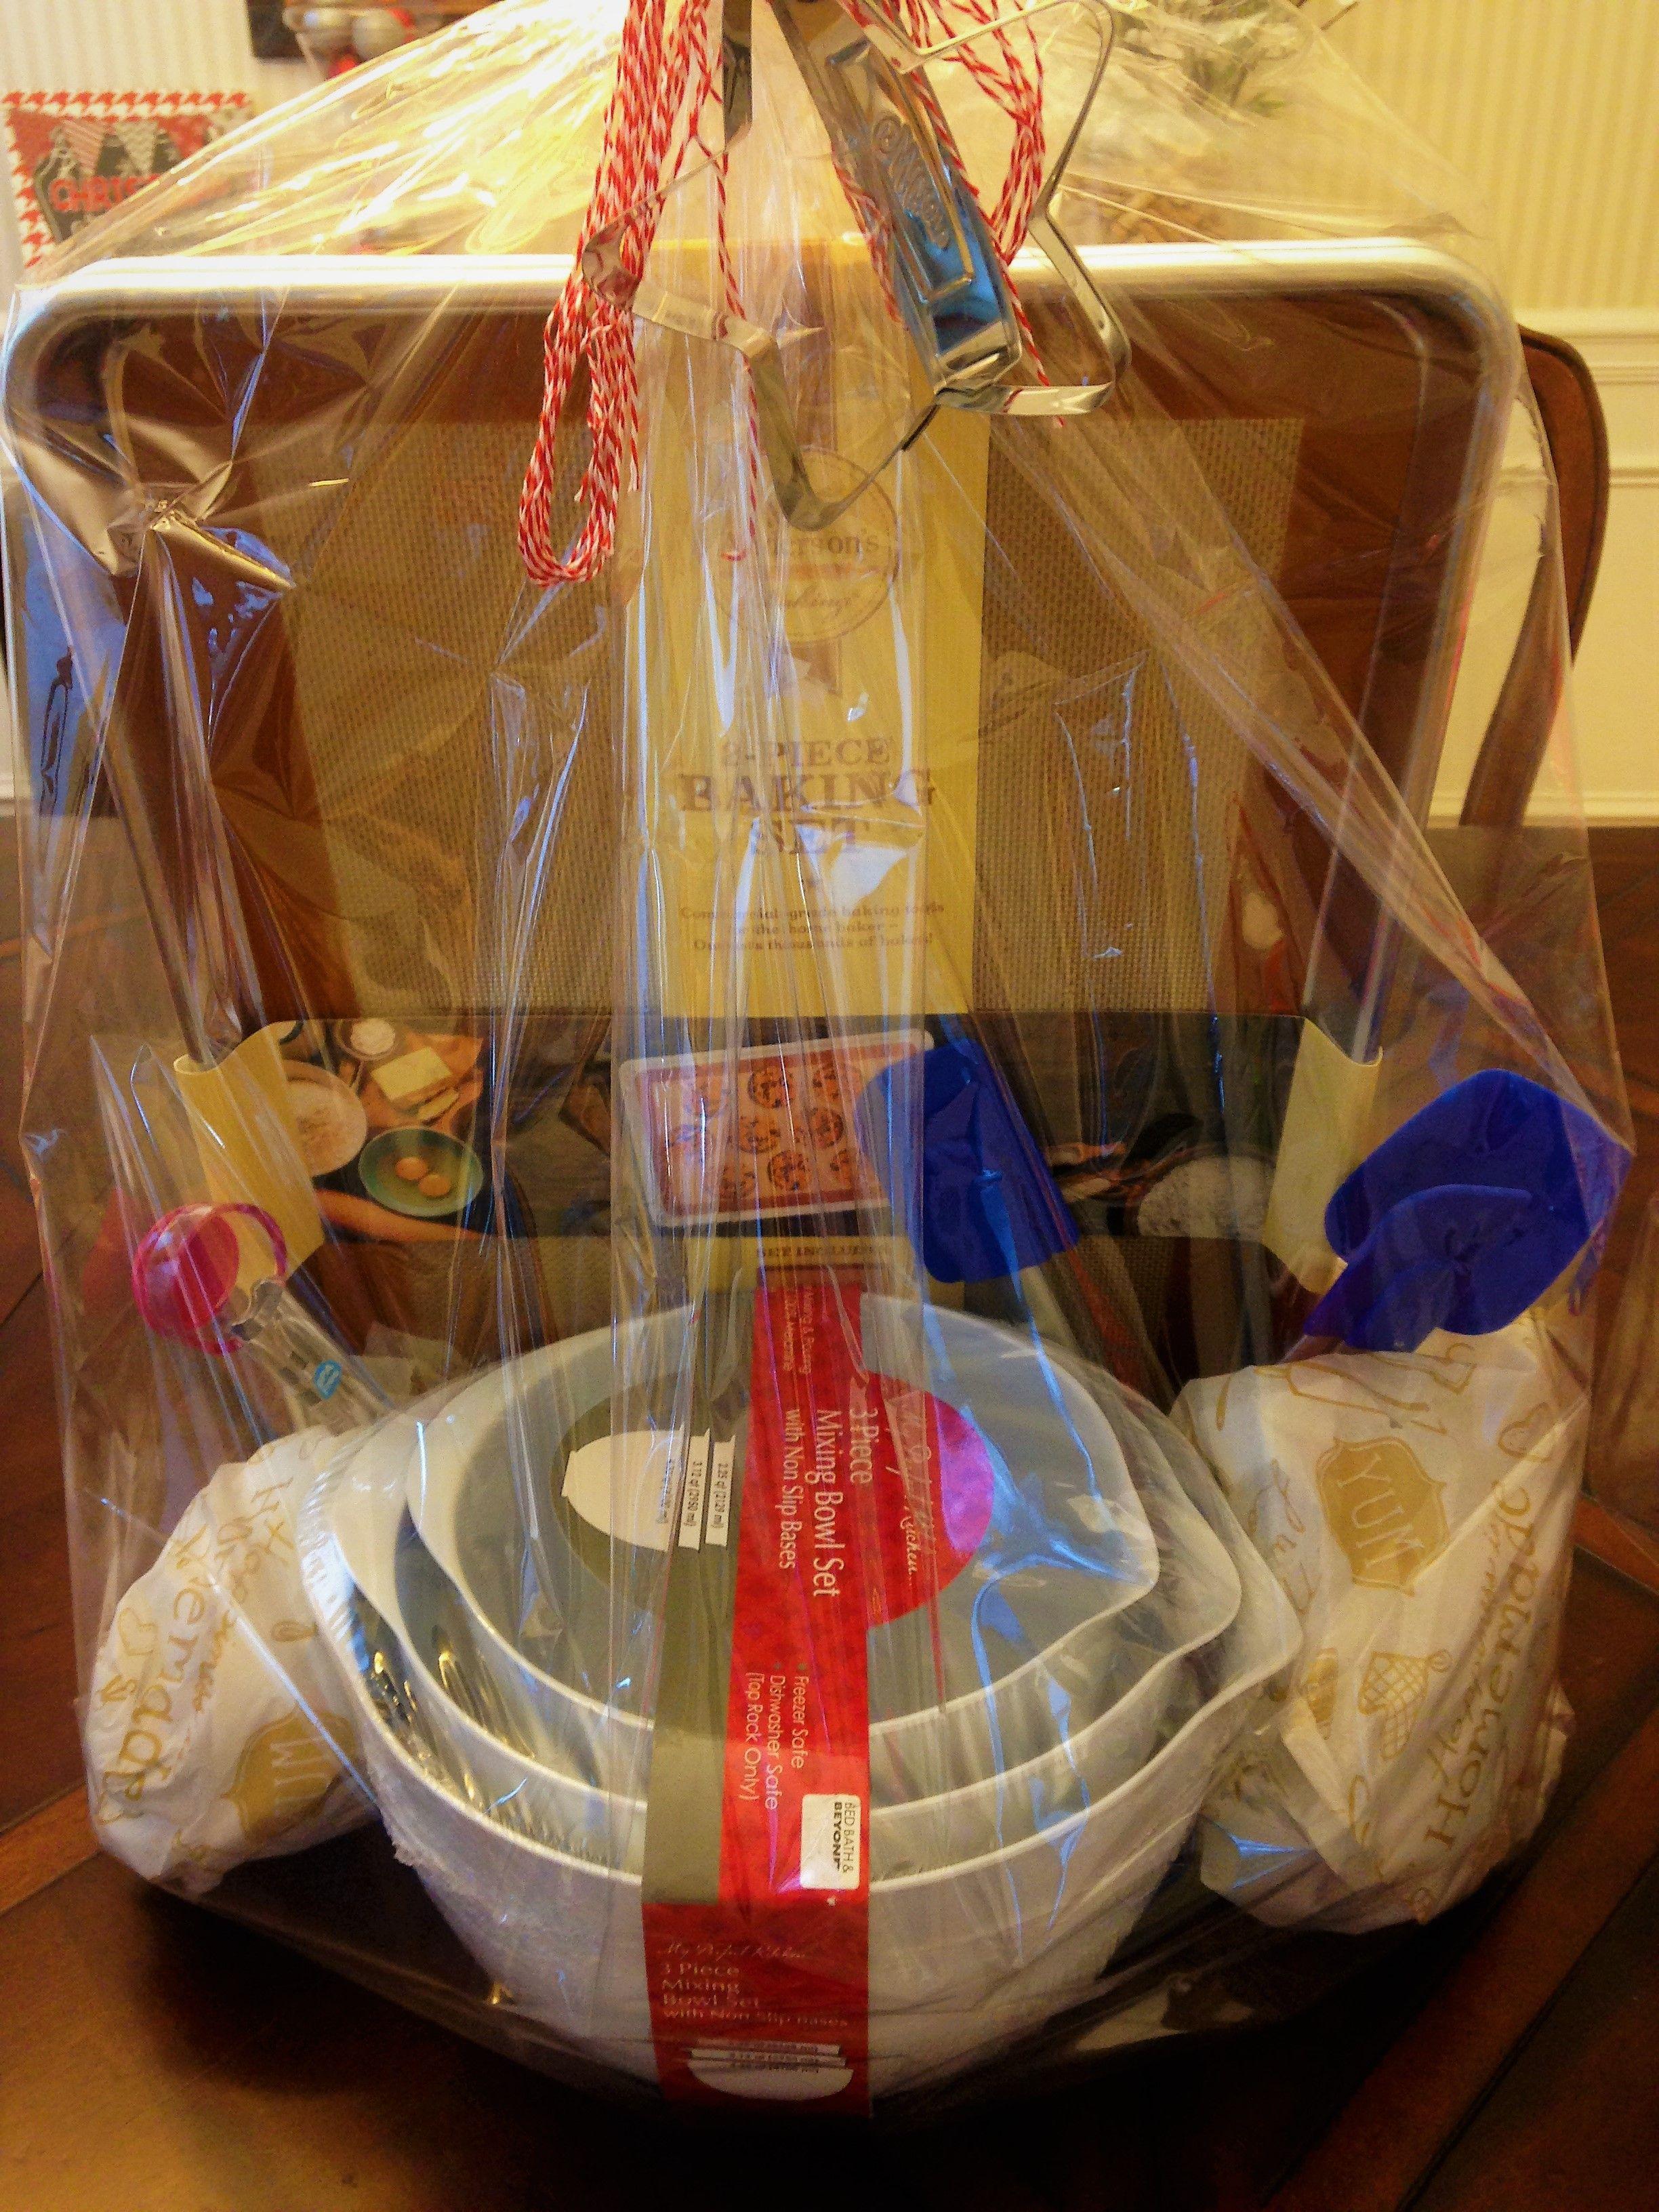 Baking gift basket baking gift basket baking gifts